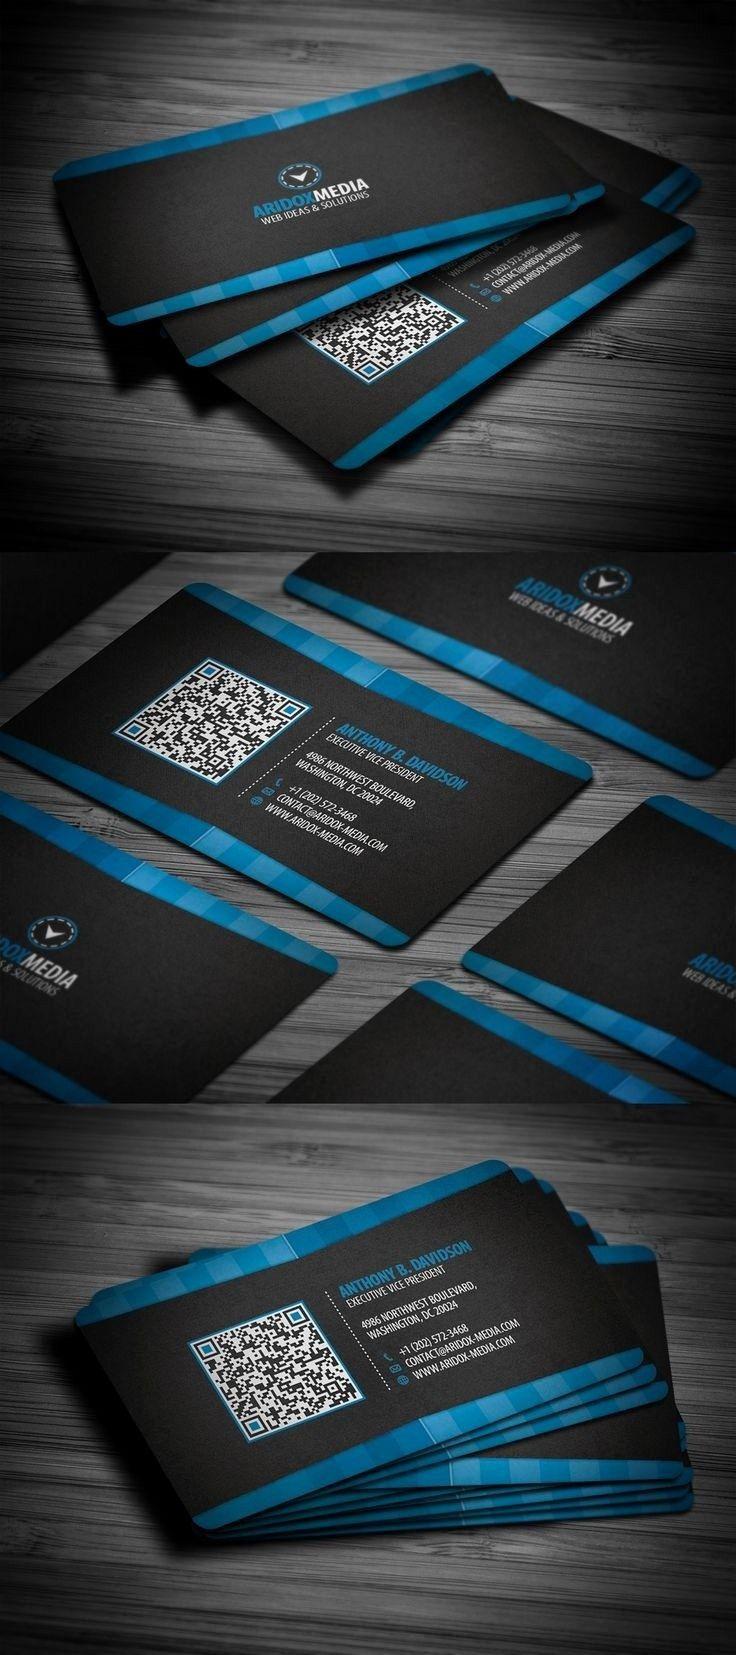 Pin By Jenifer Dun On Business Cards Template Pinterest Buy